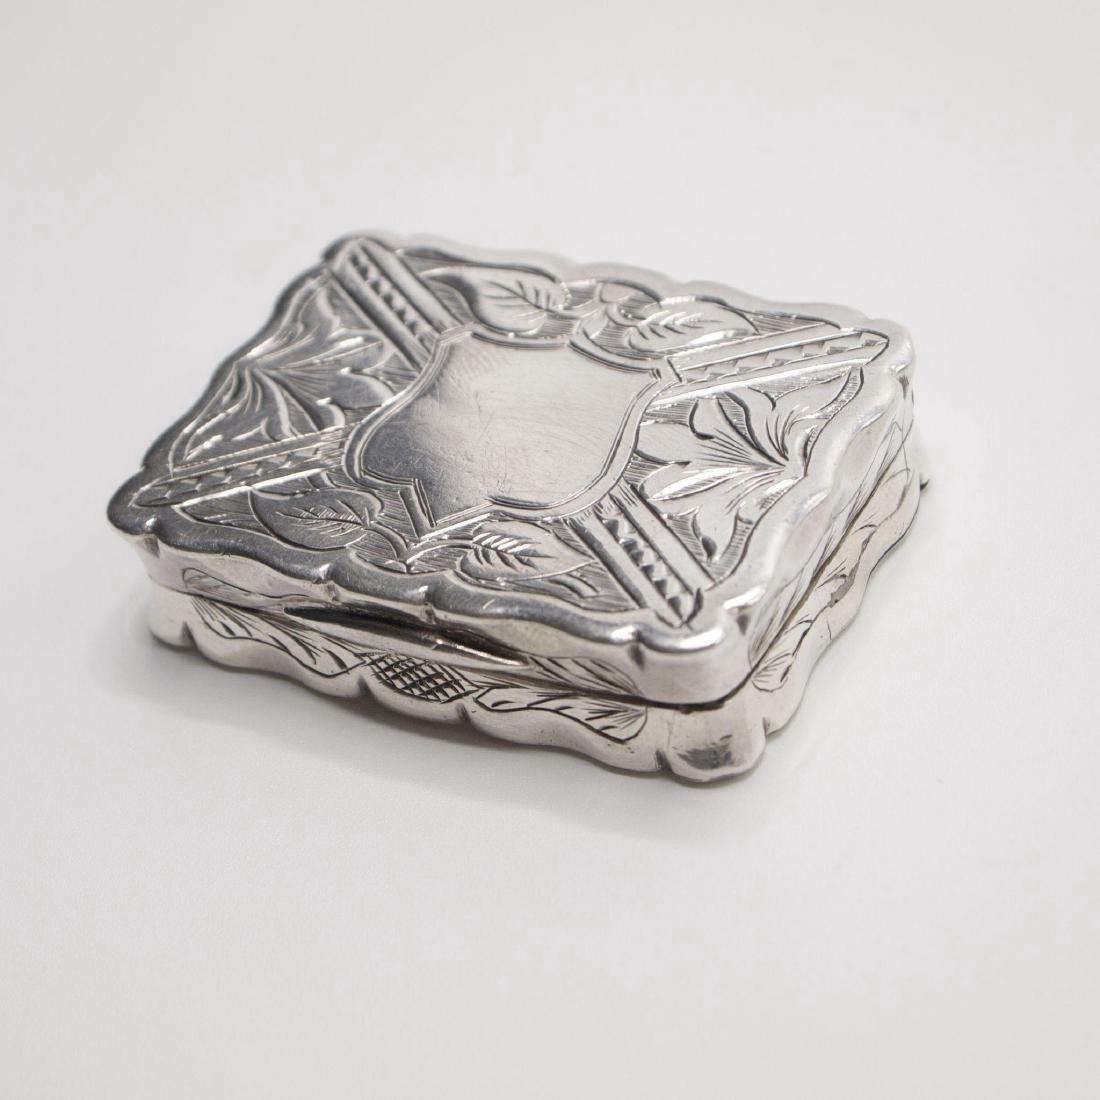 Antique Victorian Sterling Silver Vinaigrette, 1875